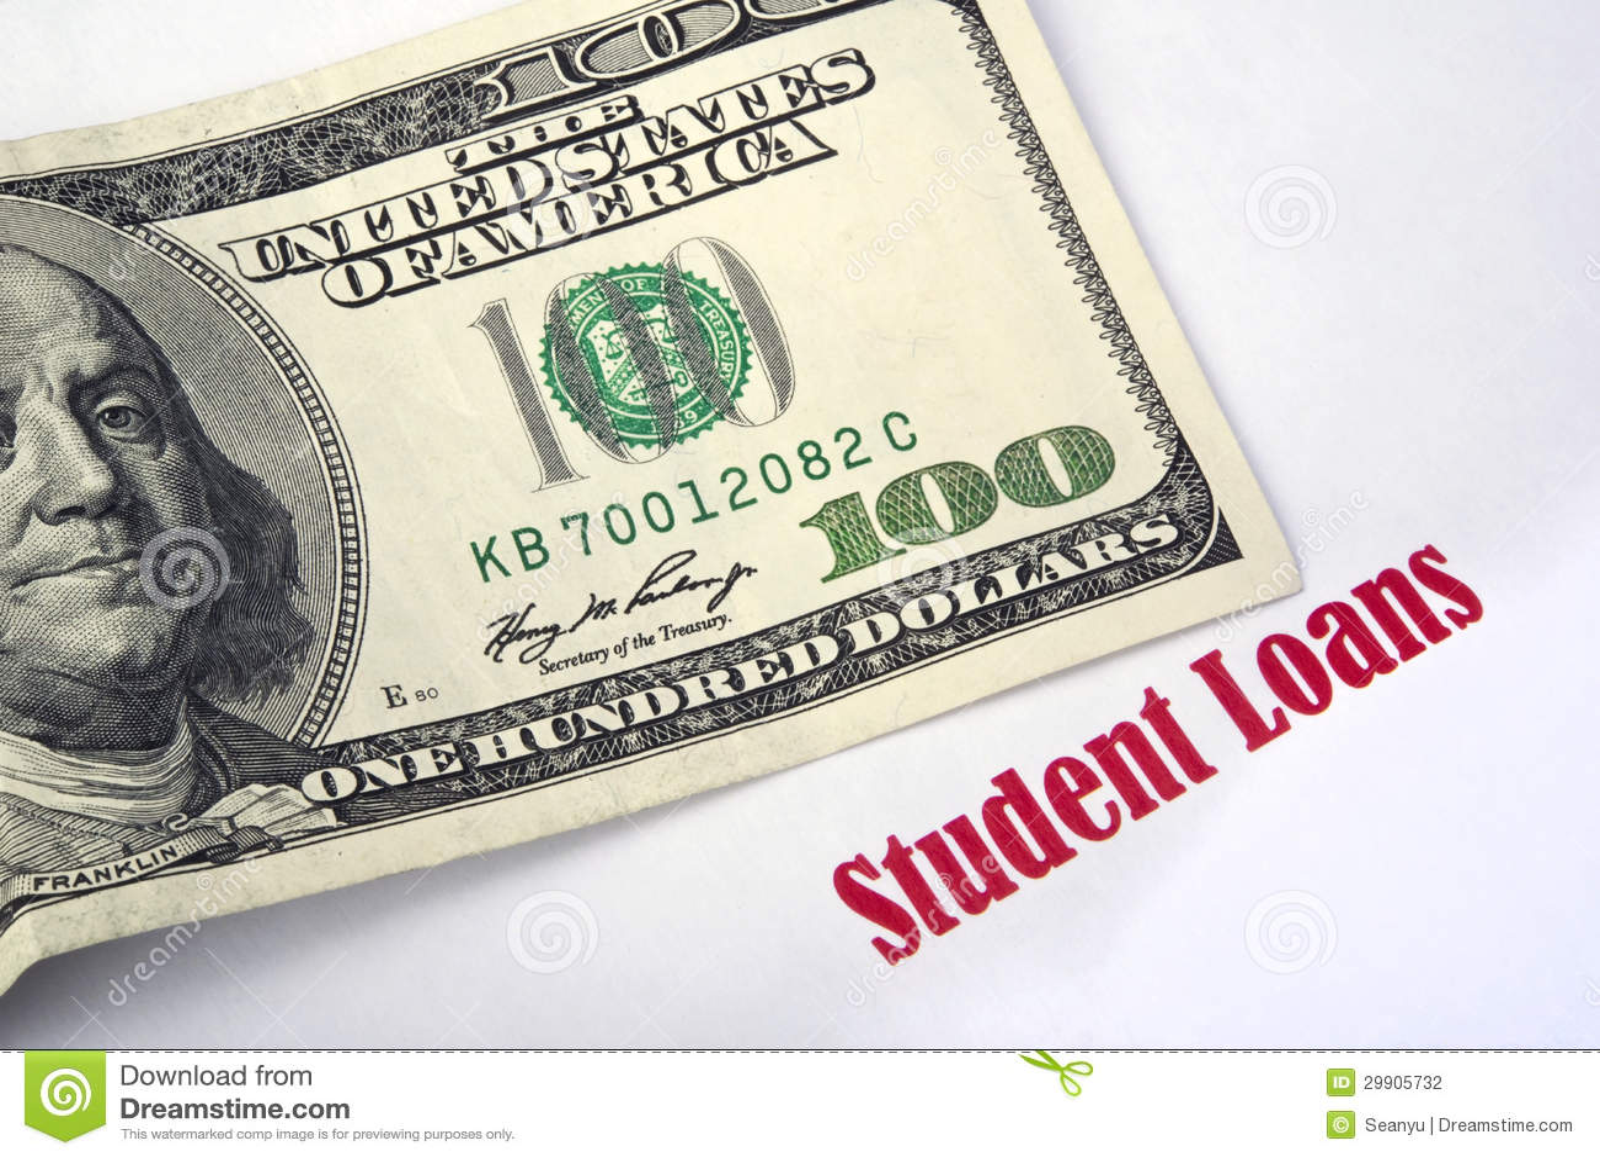 Student Loans Debt For Education Vector Illustration ...